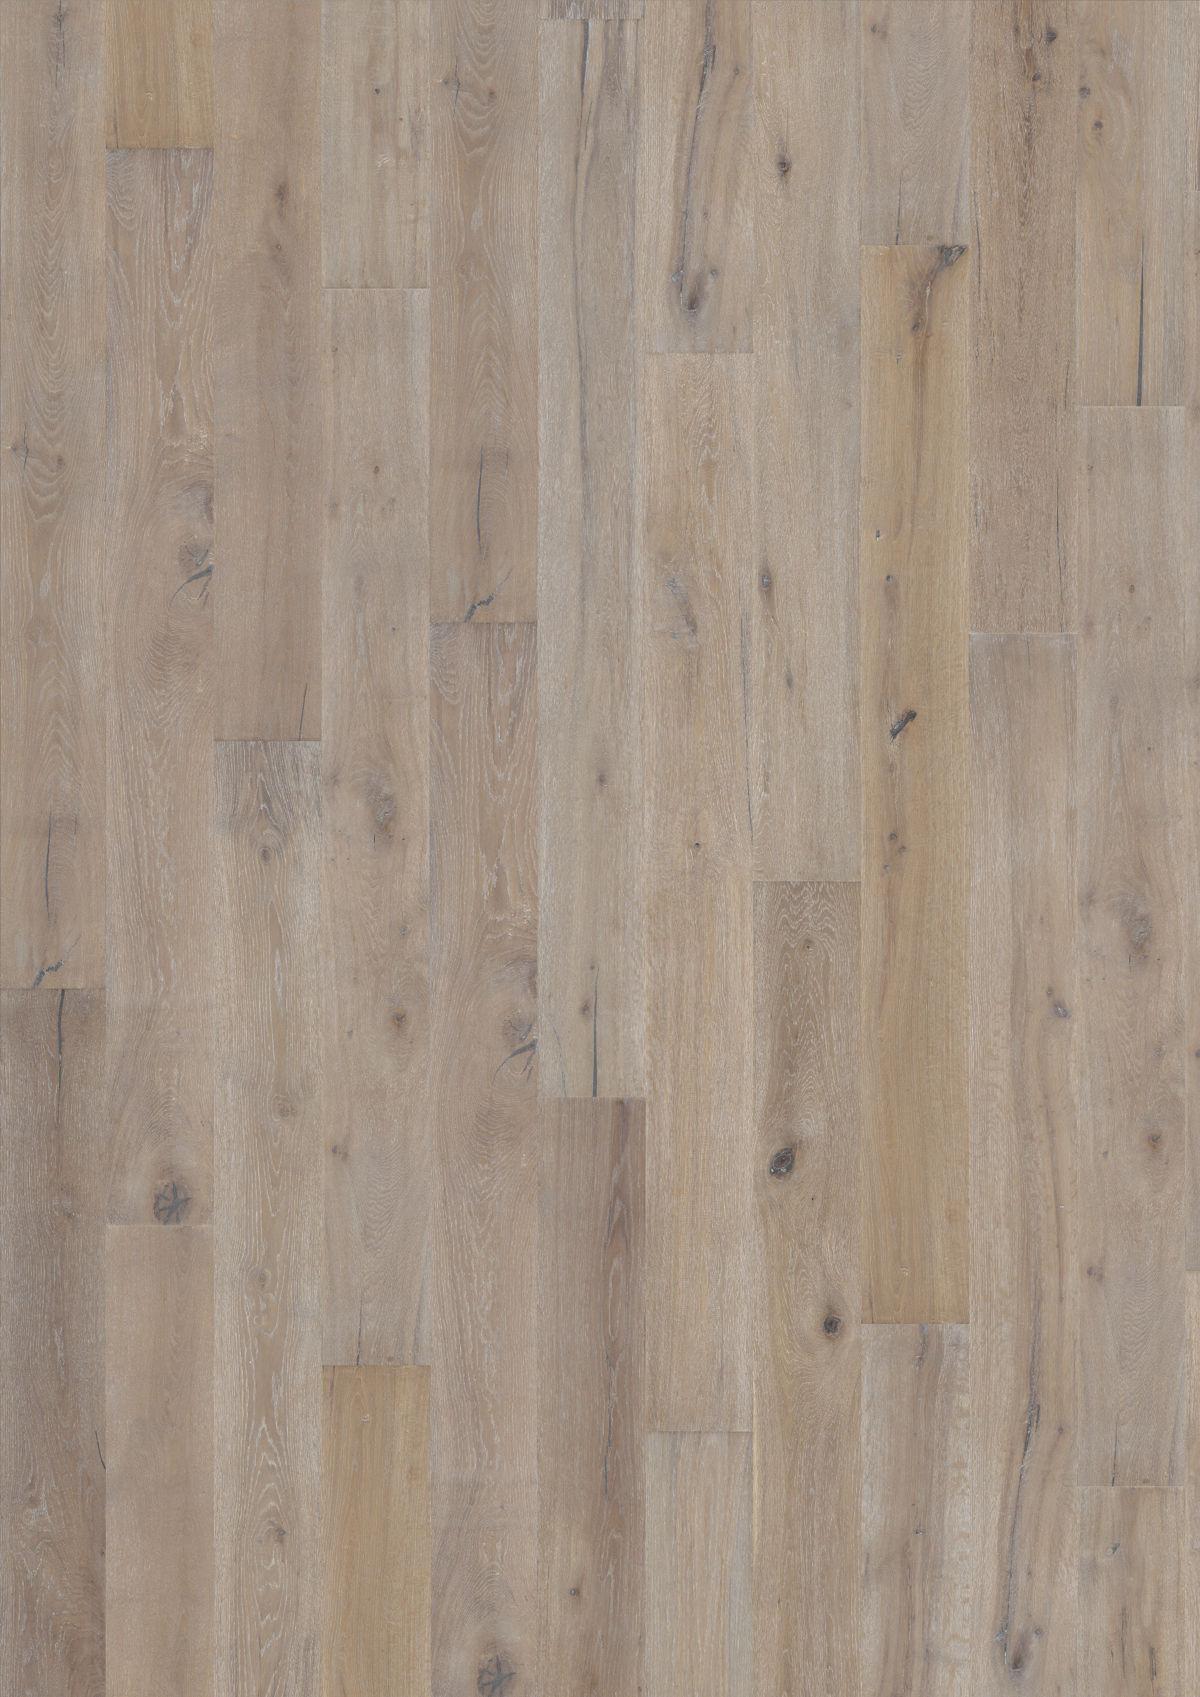 kahrs artisan oak linen engineered wood flooring. Black Bedroom Furniture Sets. Home Design Ideas